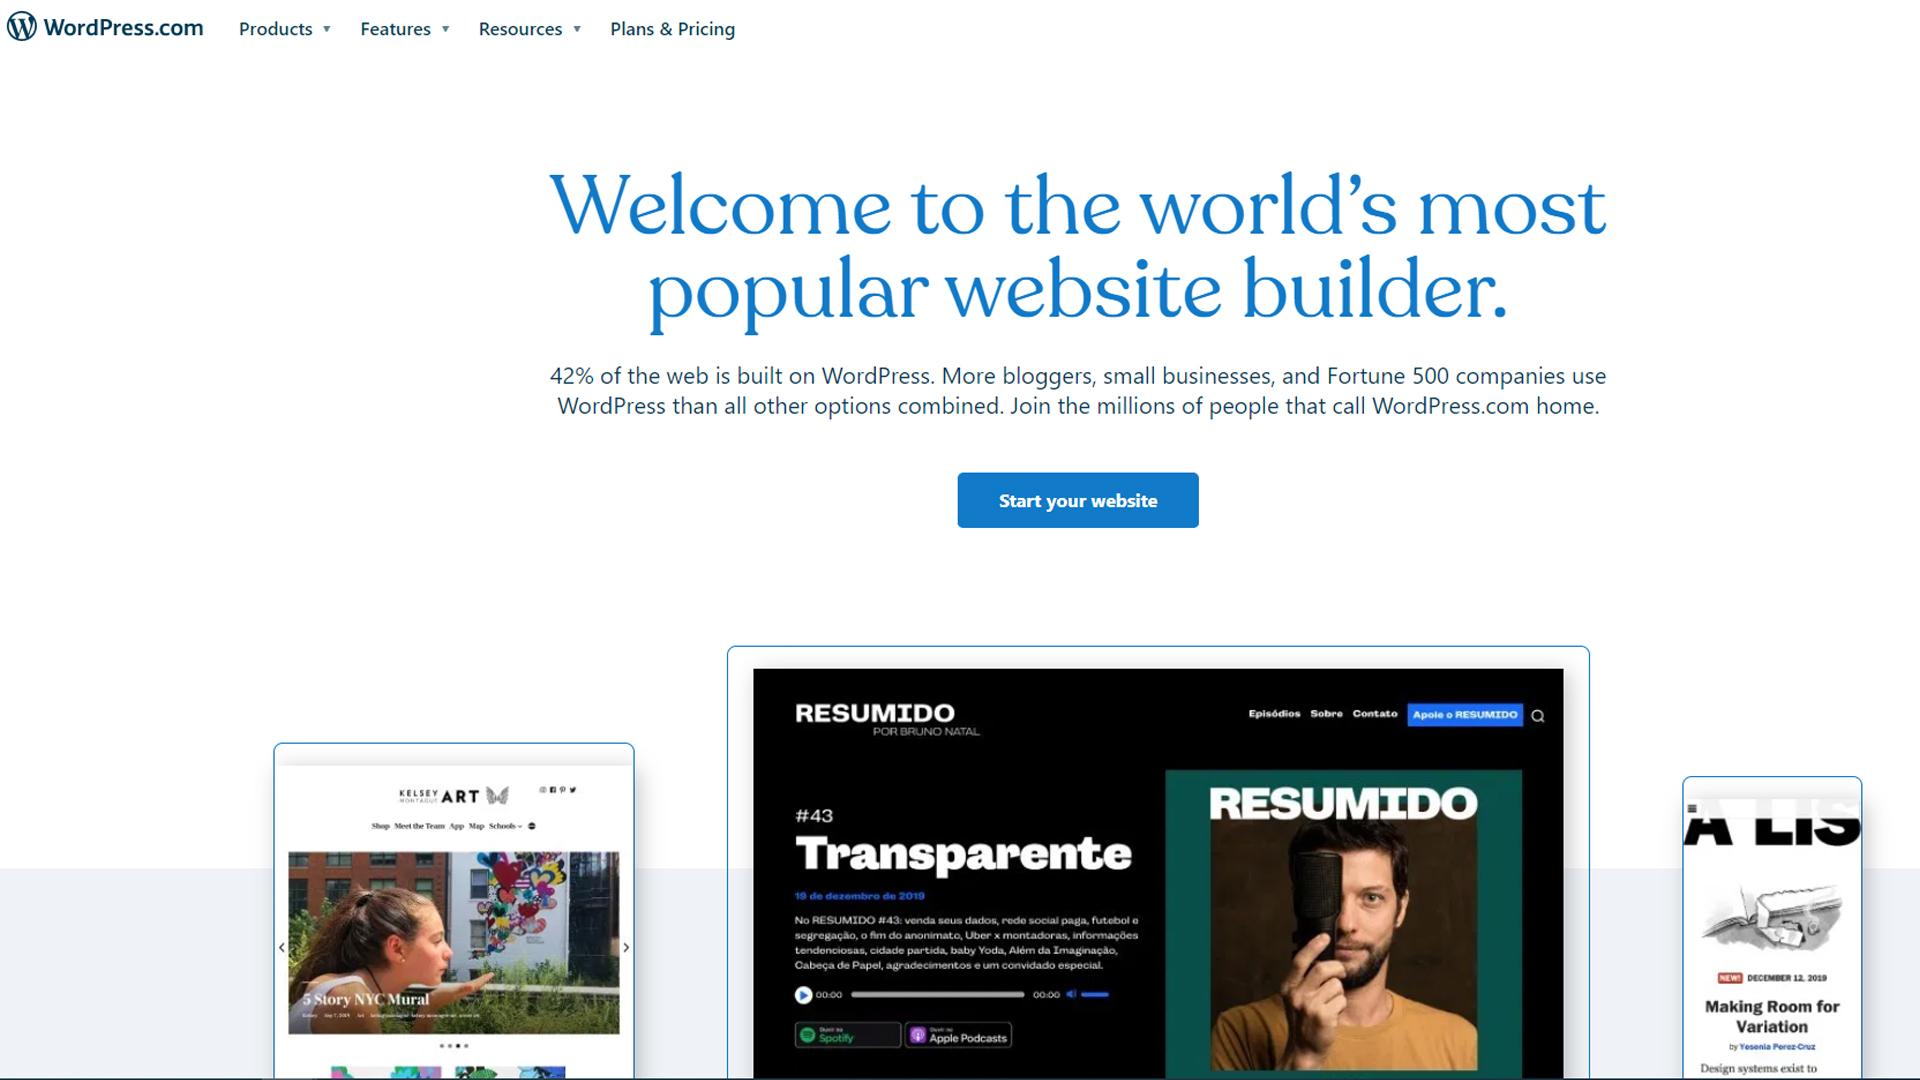 WordPress's homepage